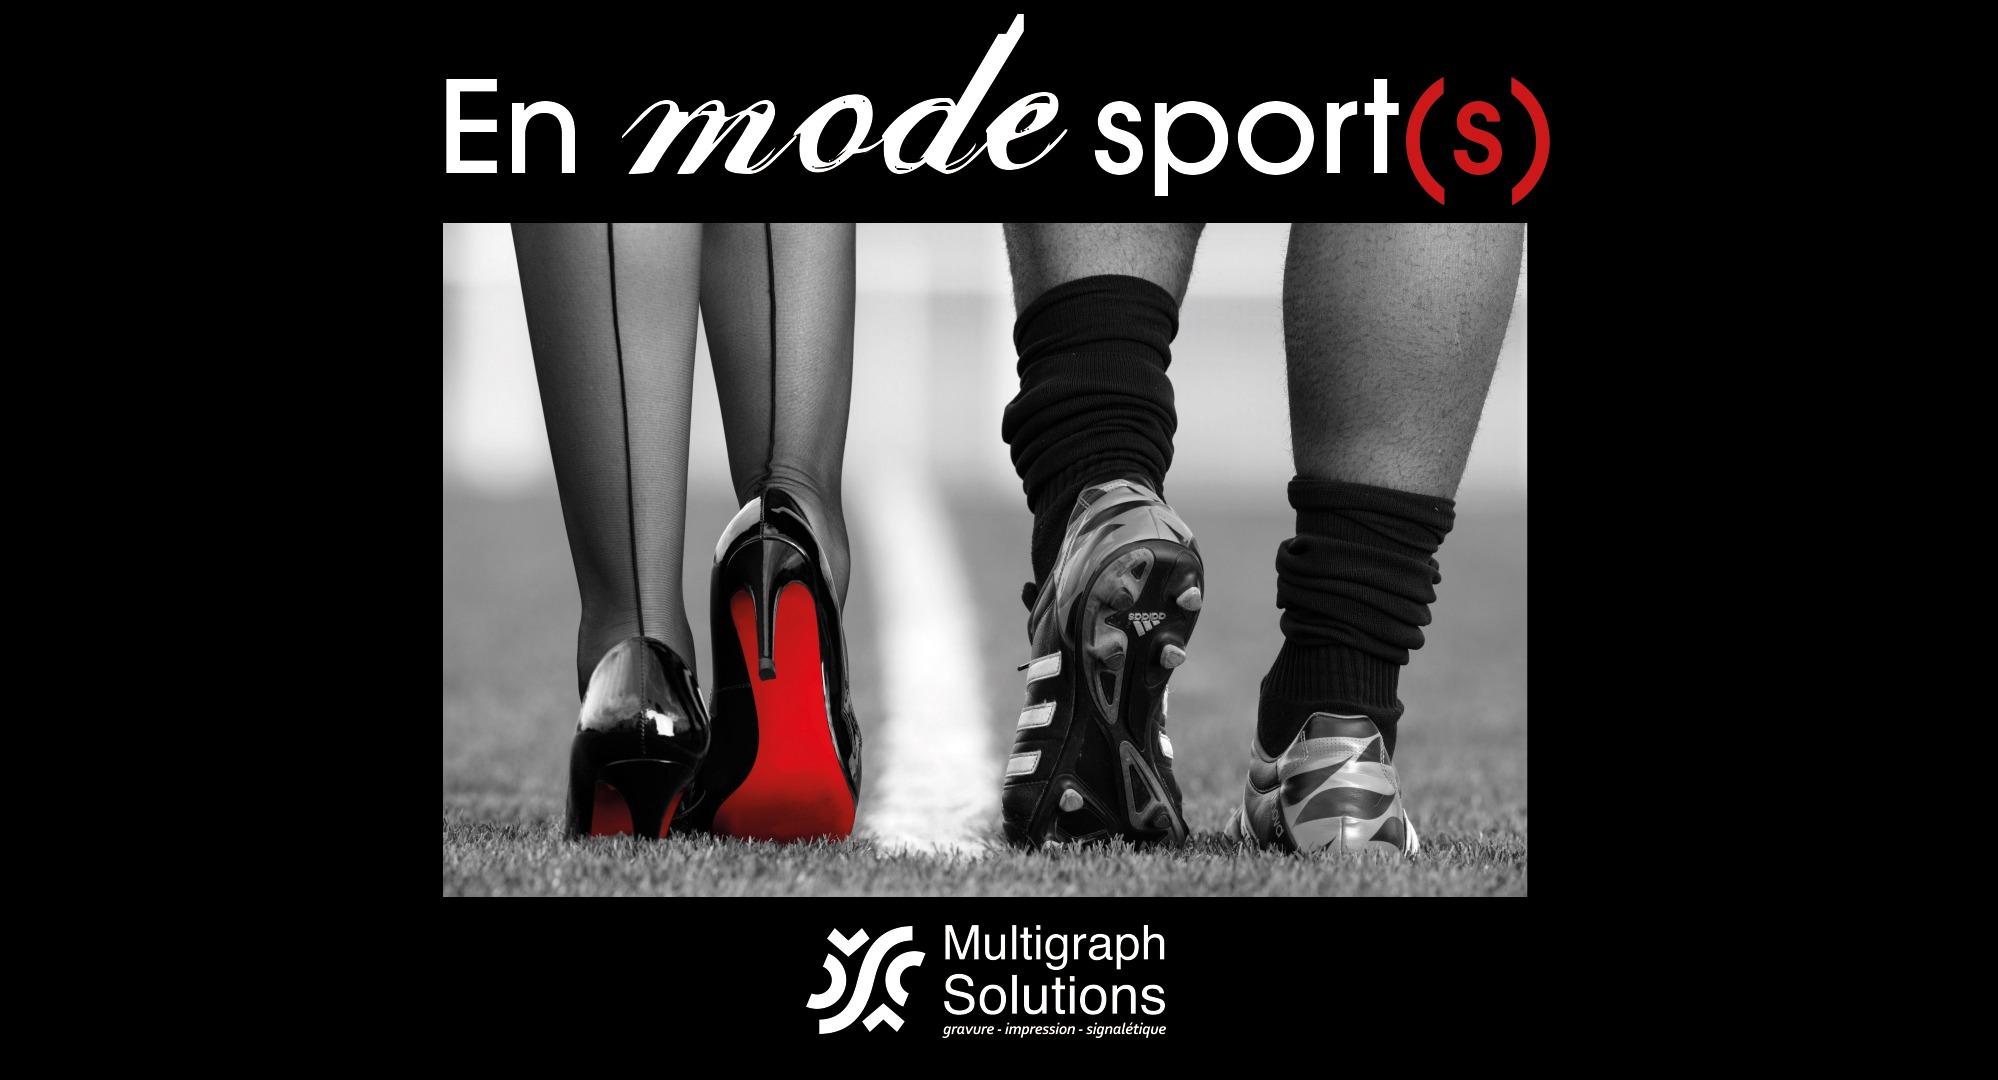 en-mode-sport-multigraph-solution